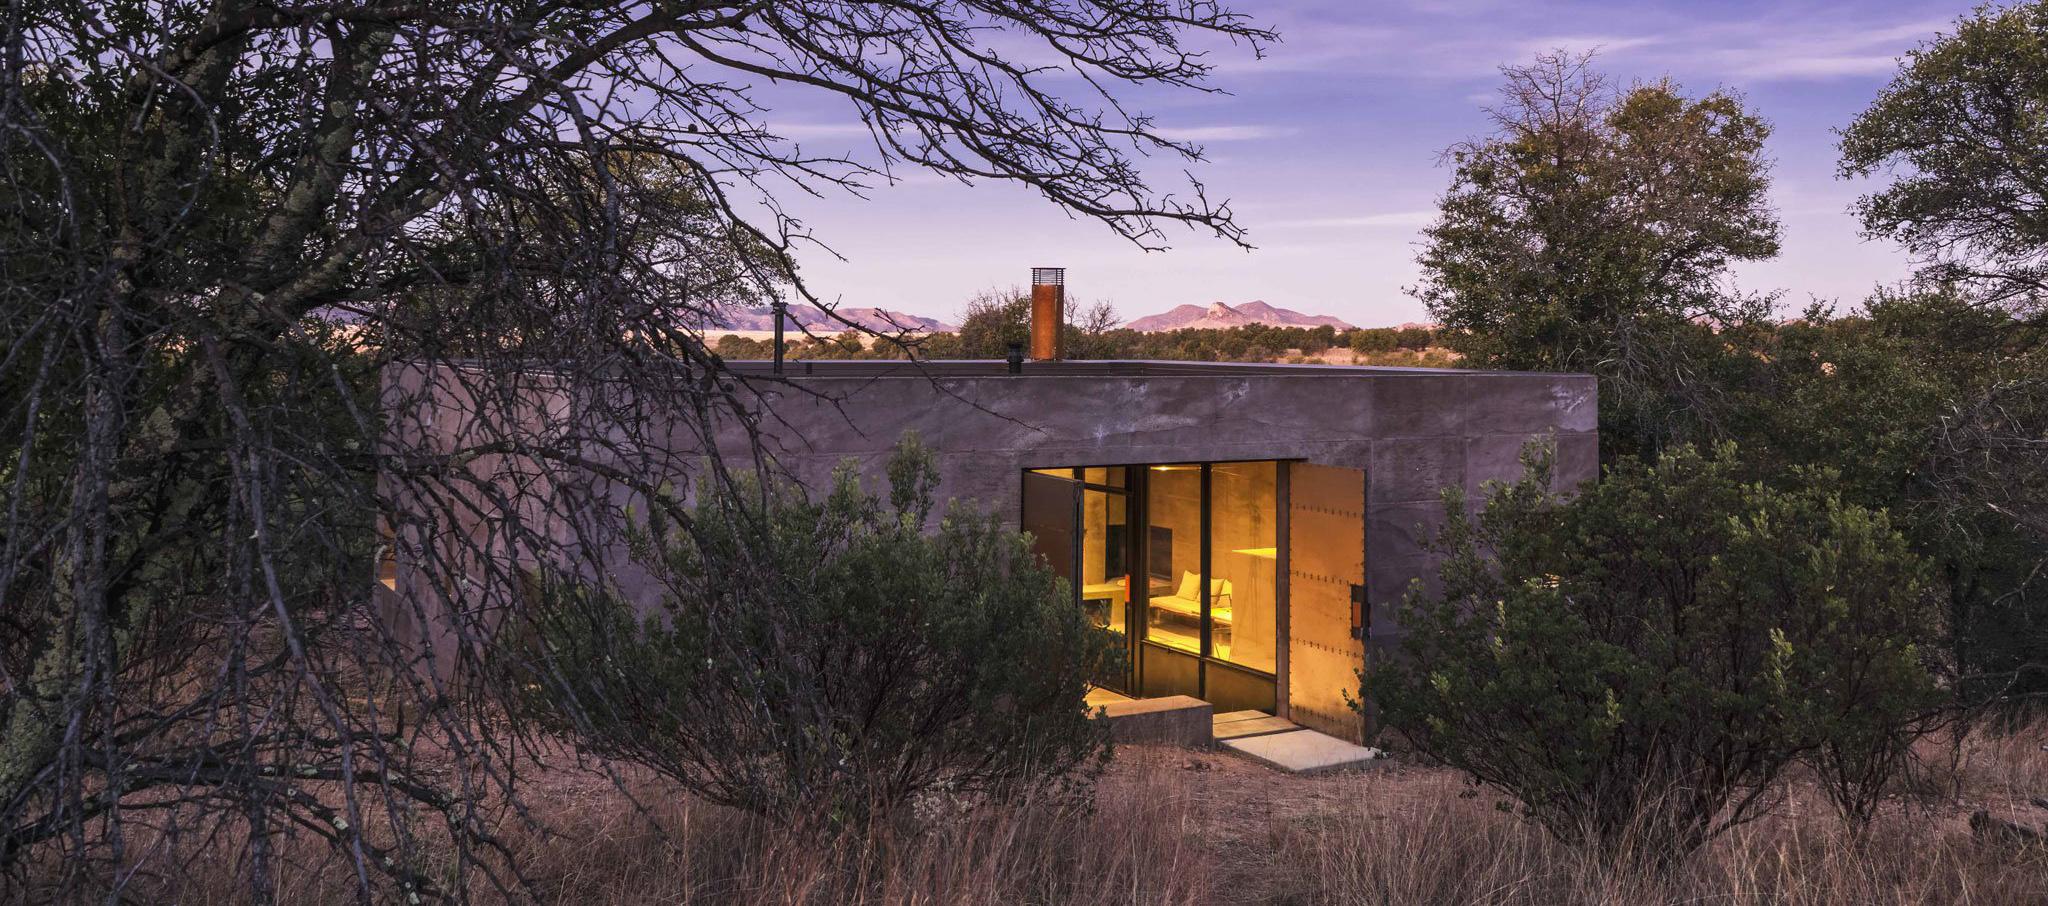 Casa Caldera por DUST. Imagen © Esto/Jeff Goldberg